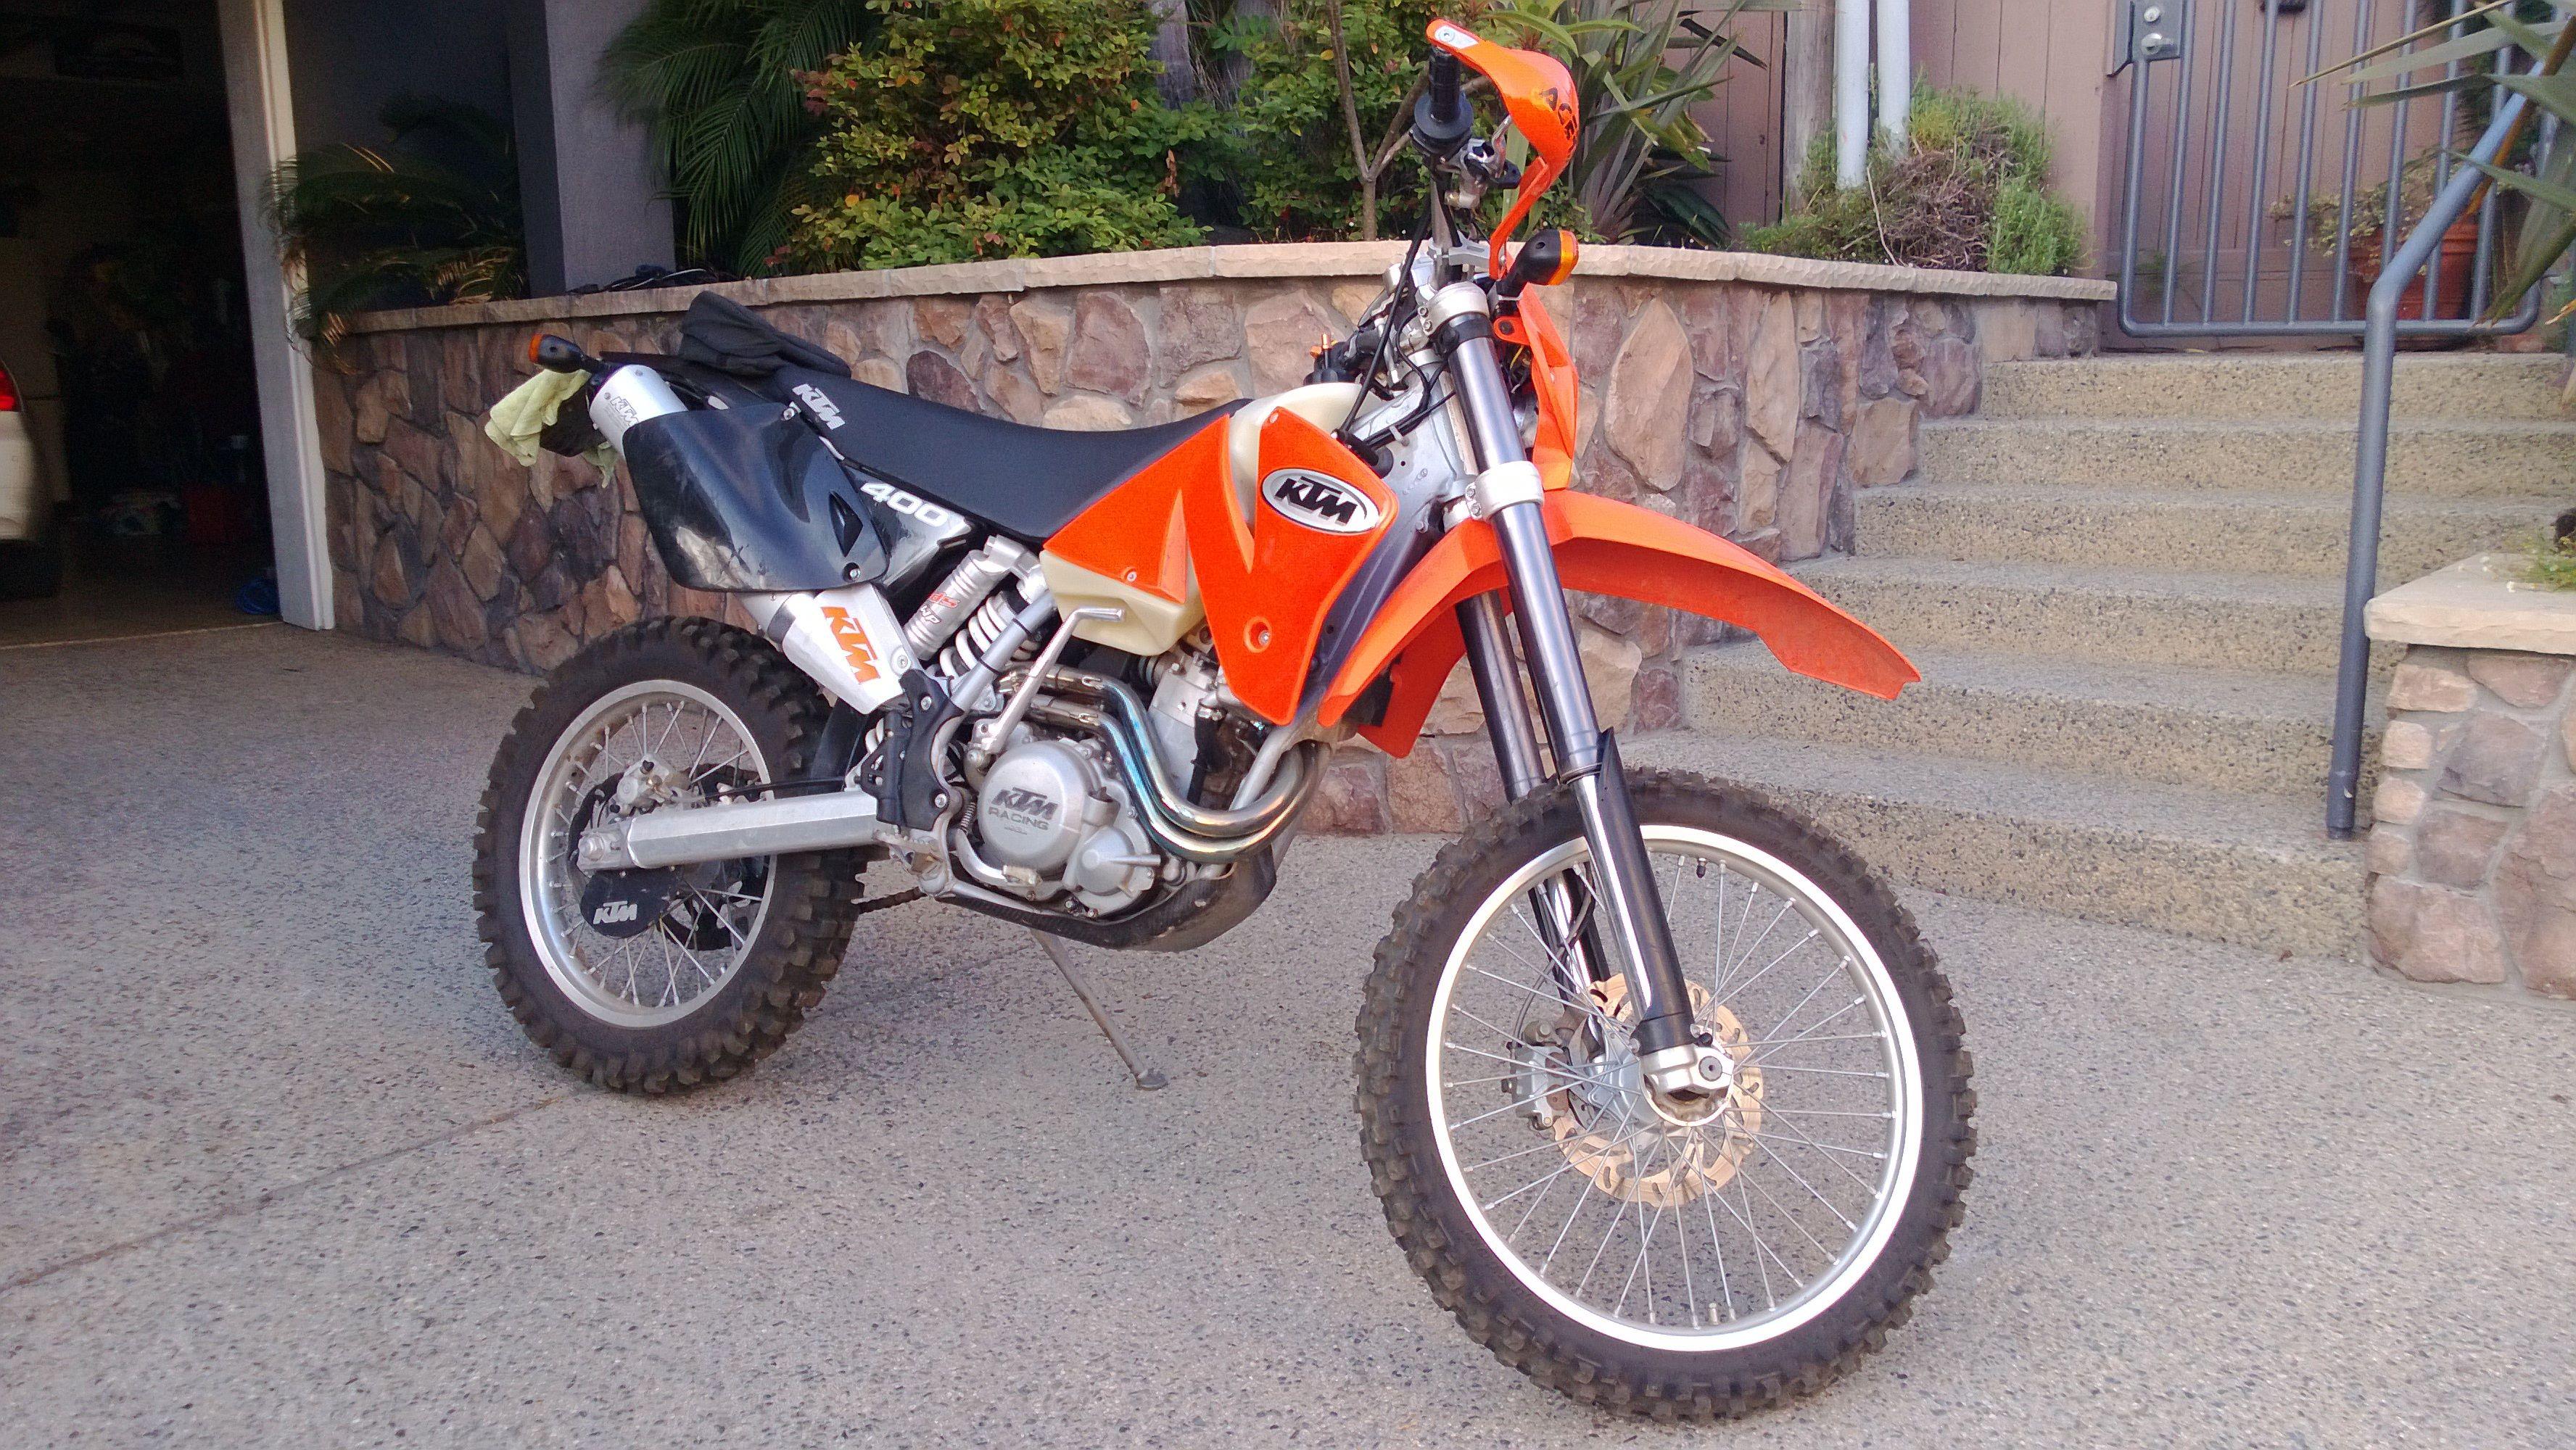 2002 Honda Cbr 600F4I1 600F4I1 Motorcycle From West